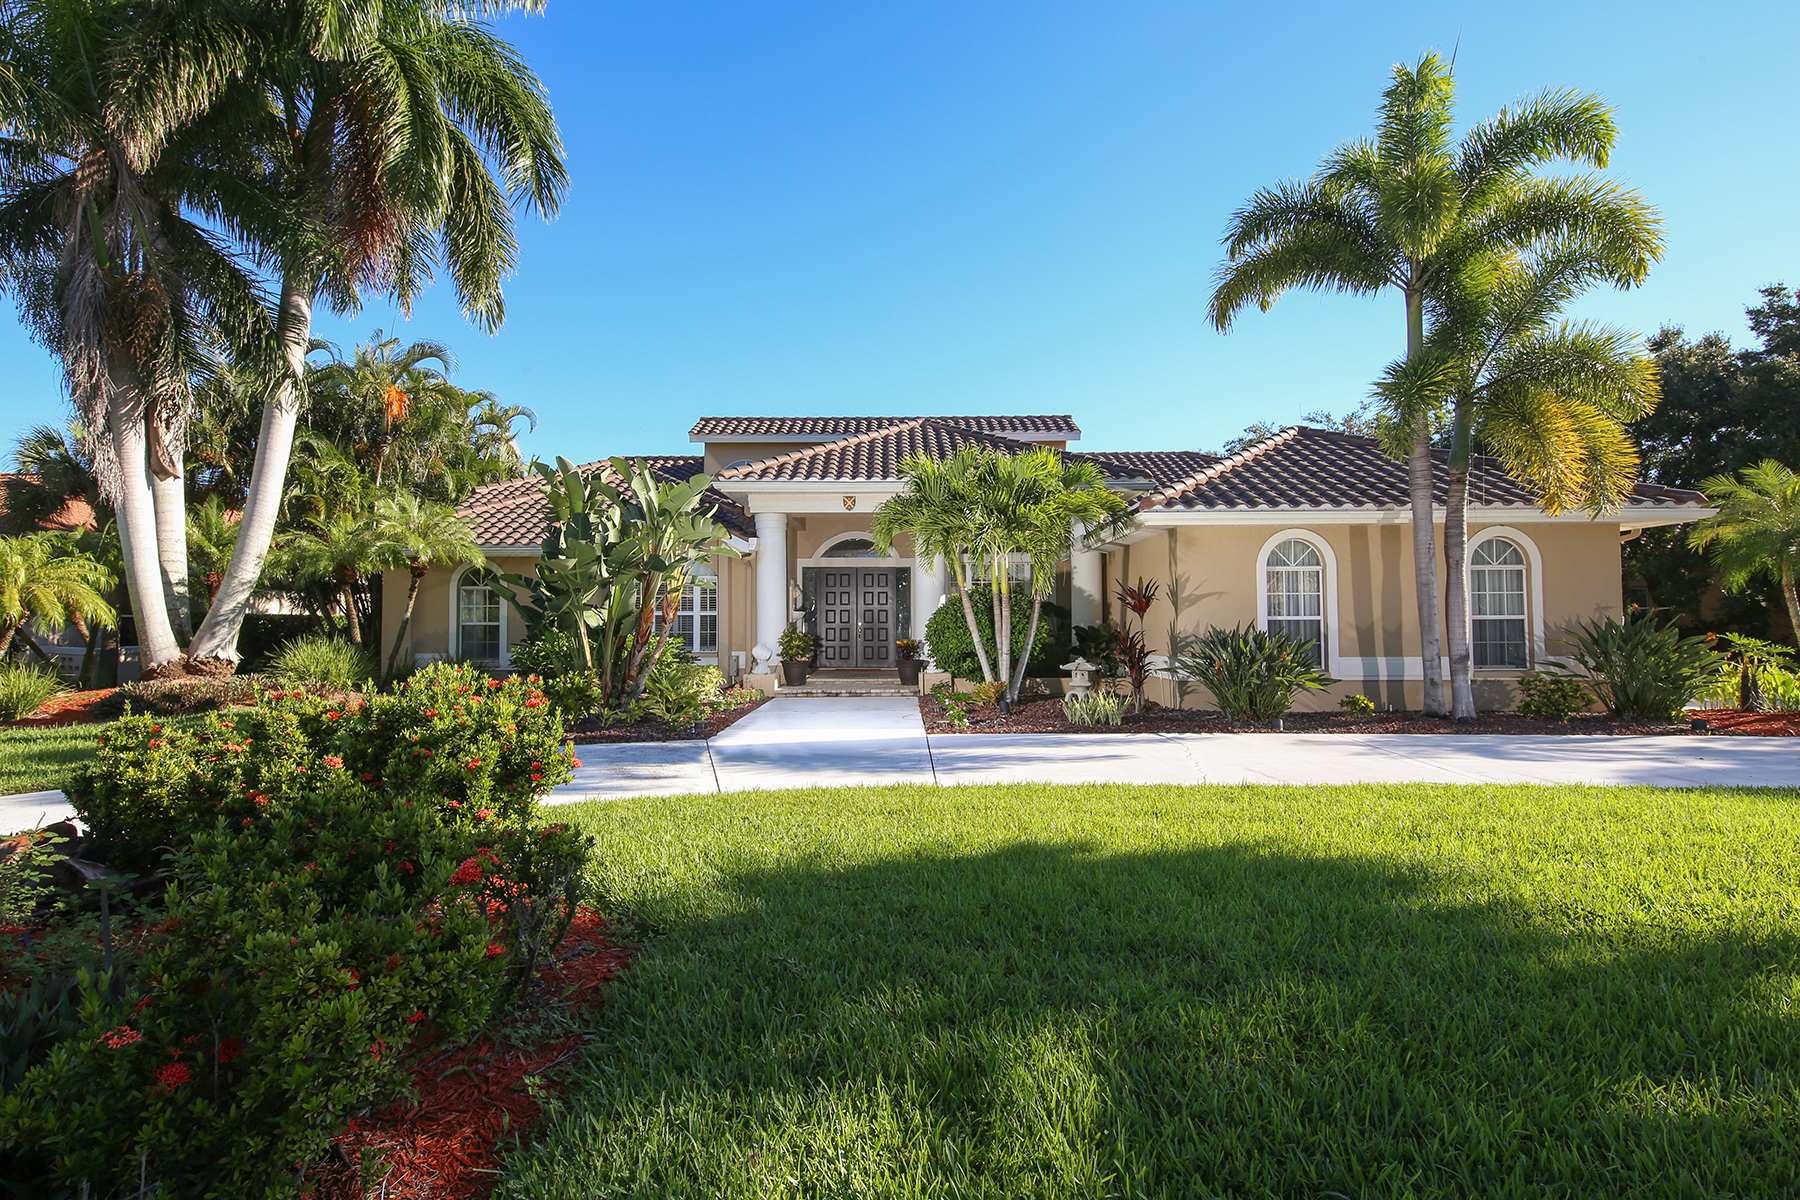 Single Family Home for Sale at PRESTANCIA 3799 Boca Pointe Dr Sarasota, Florida, 34238 United States